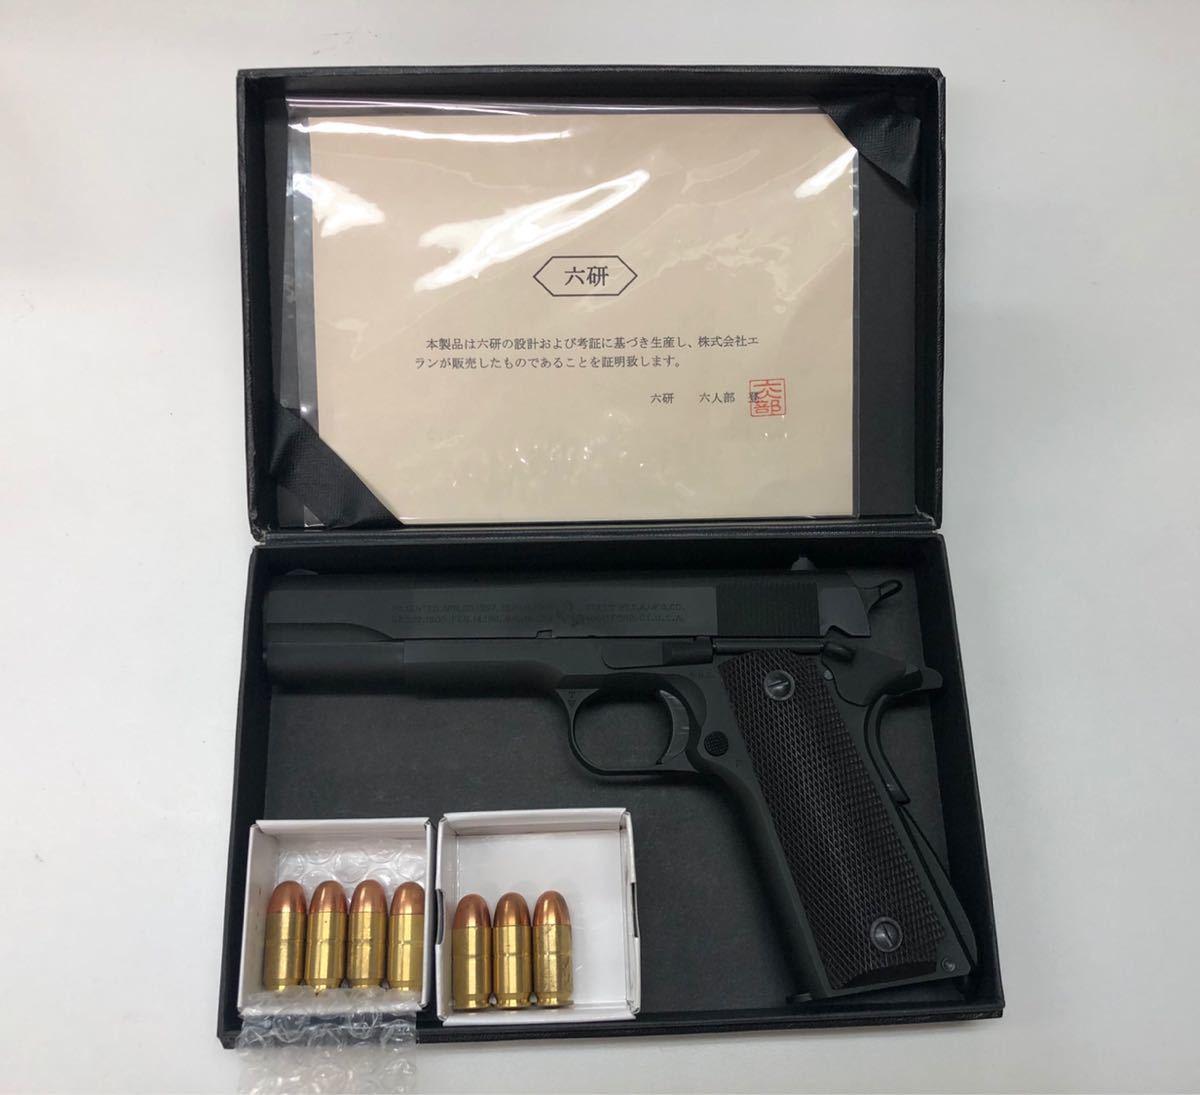 (X/O) THE REAL McCOY'S / VICTORY COLT Automatic Pistol / M1911A1 / 六研 / エラン販売 / リアルマッコイズ M1911 モデルガン _画像3